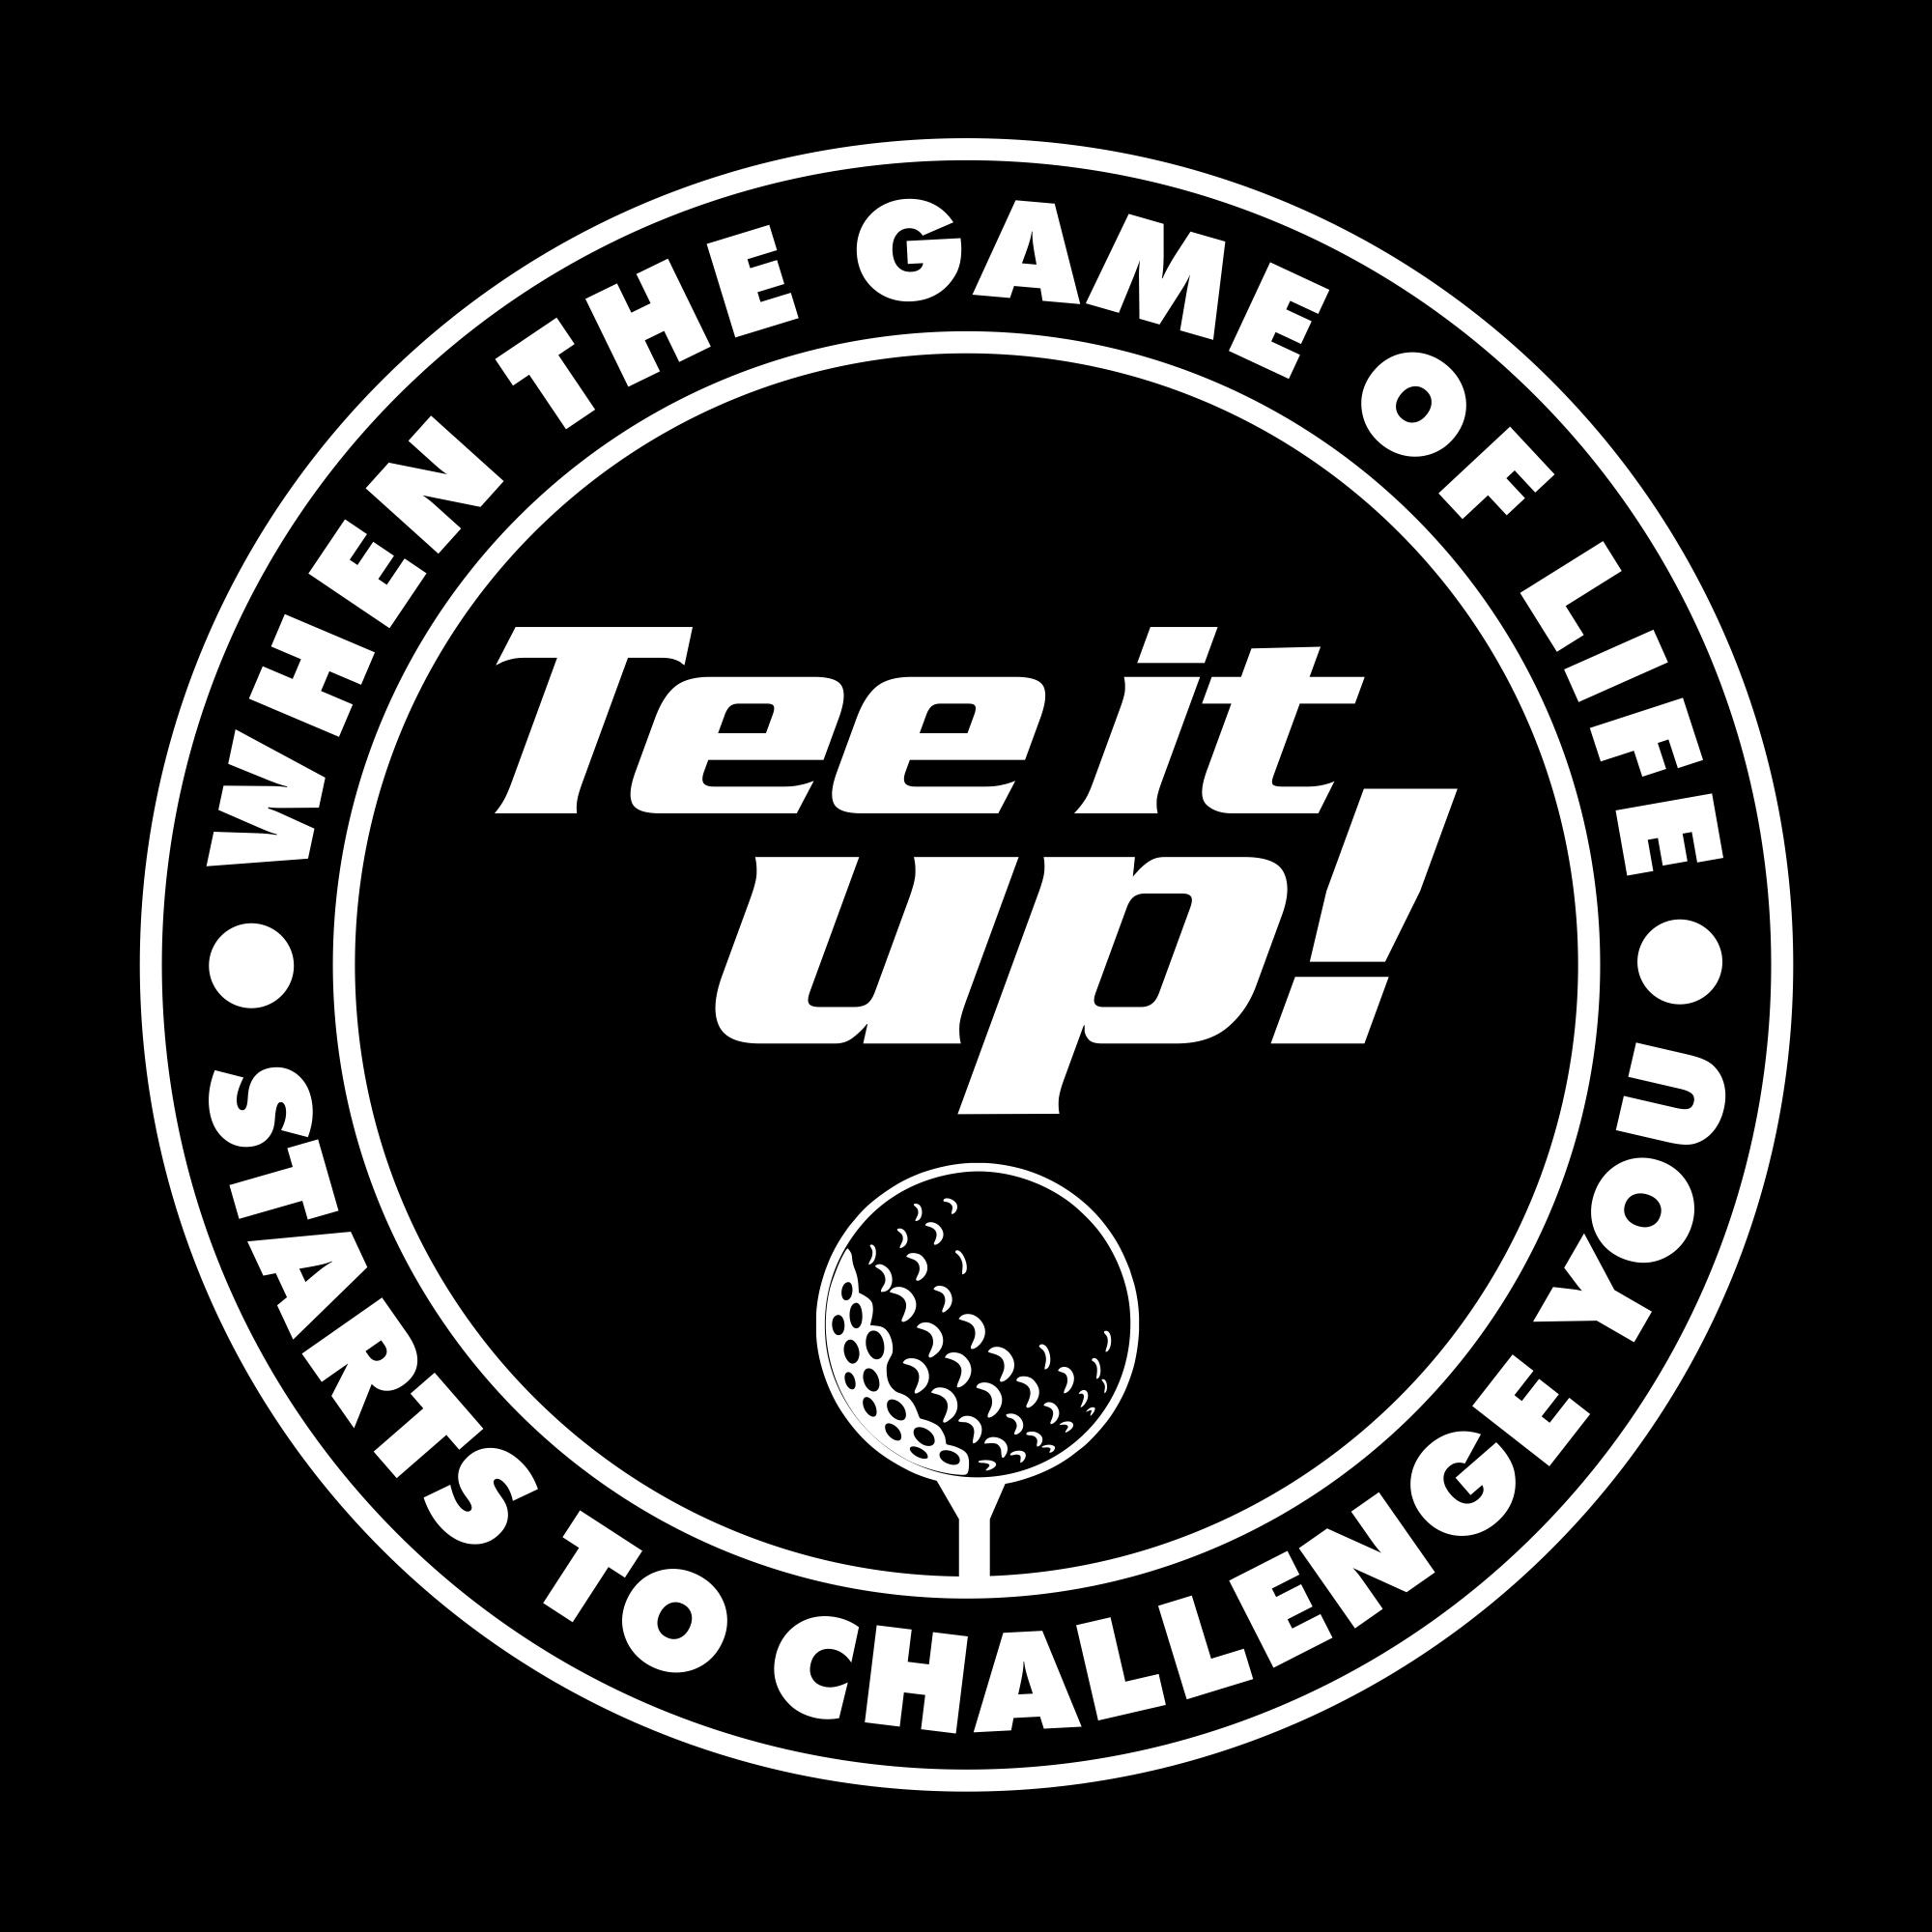 Tee it up! & Play 18! artwork